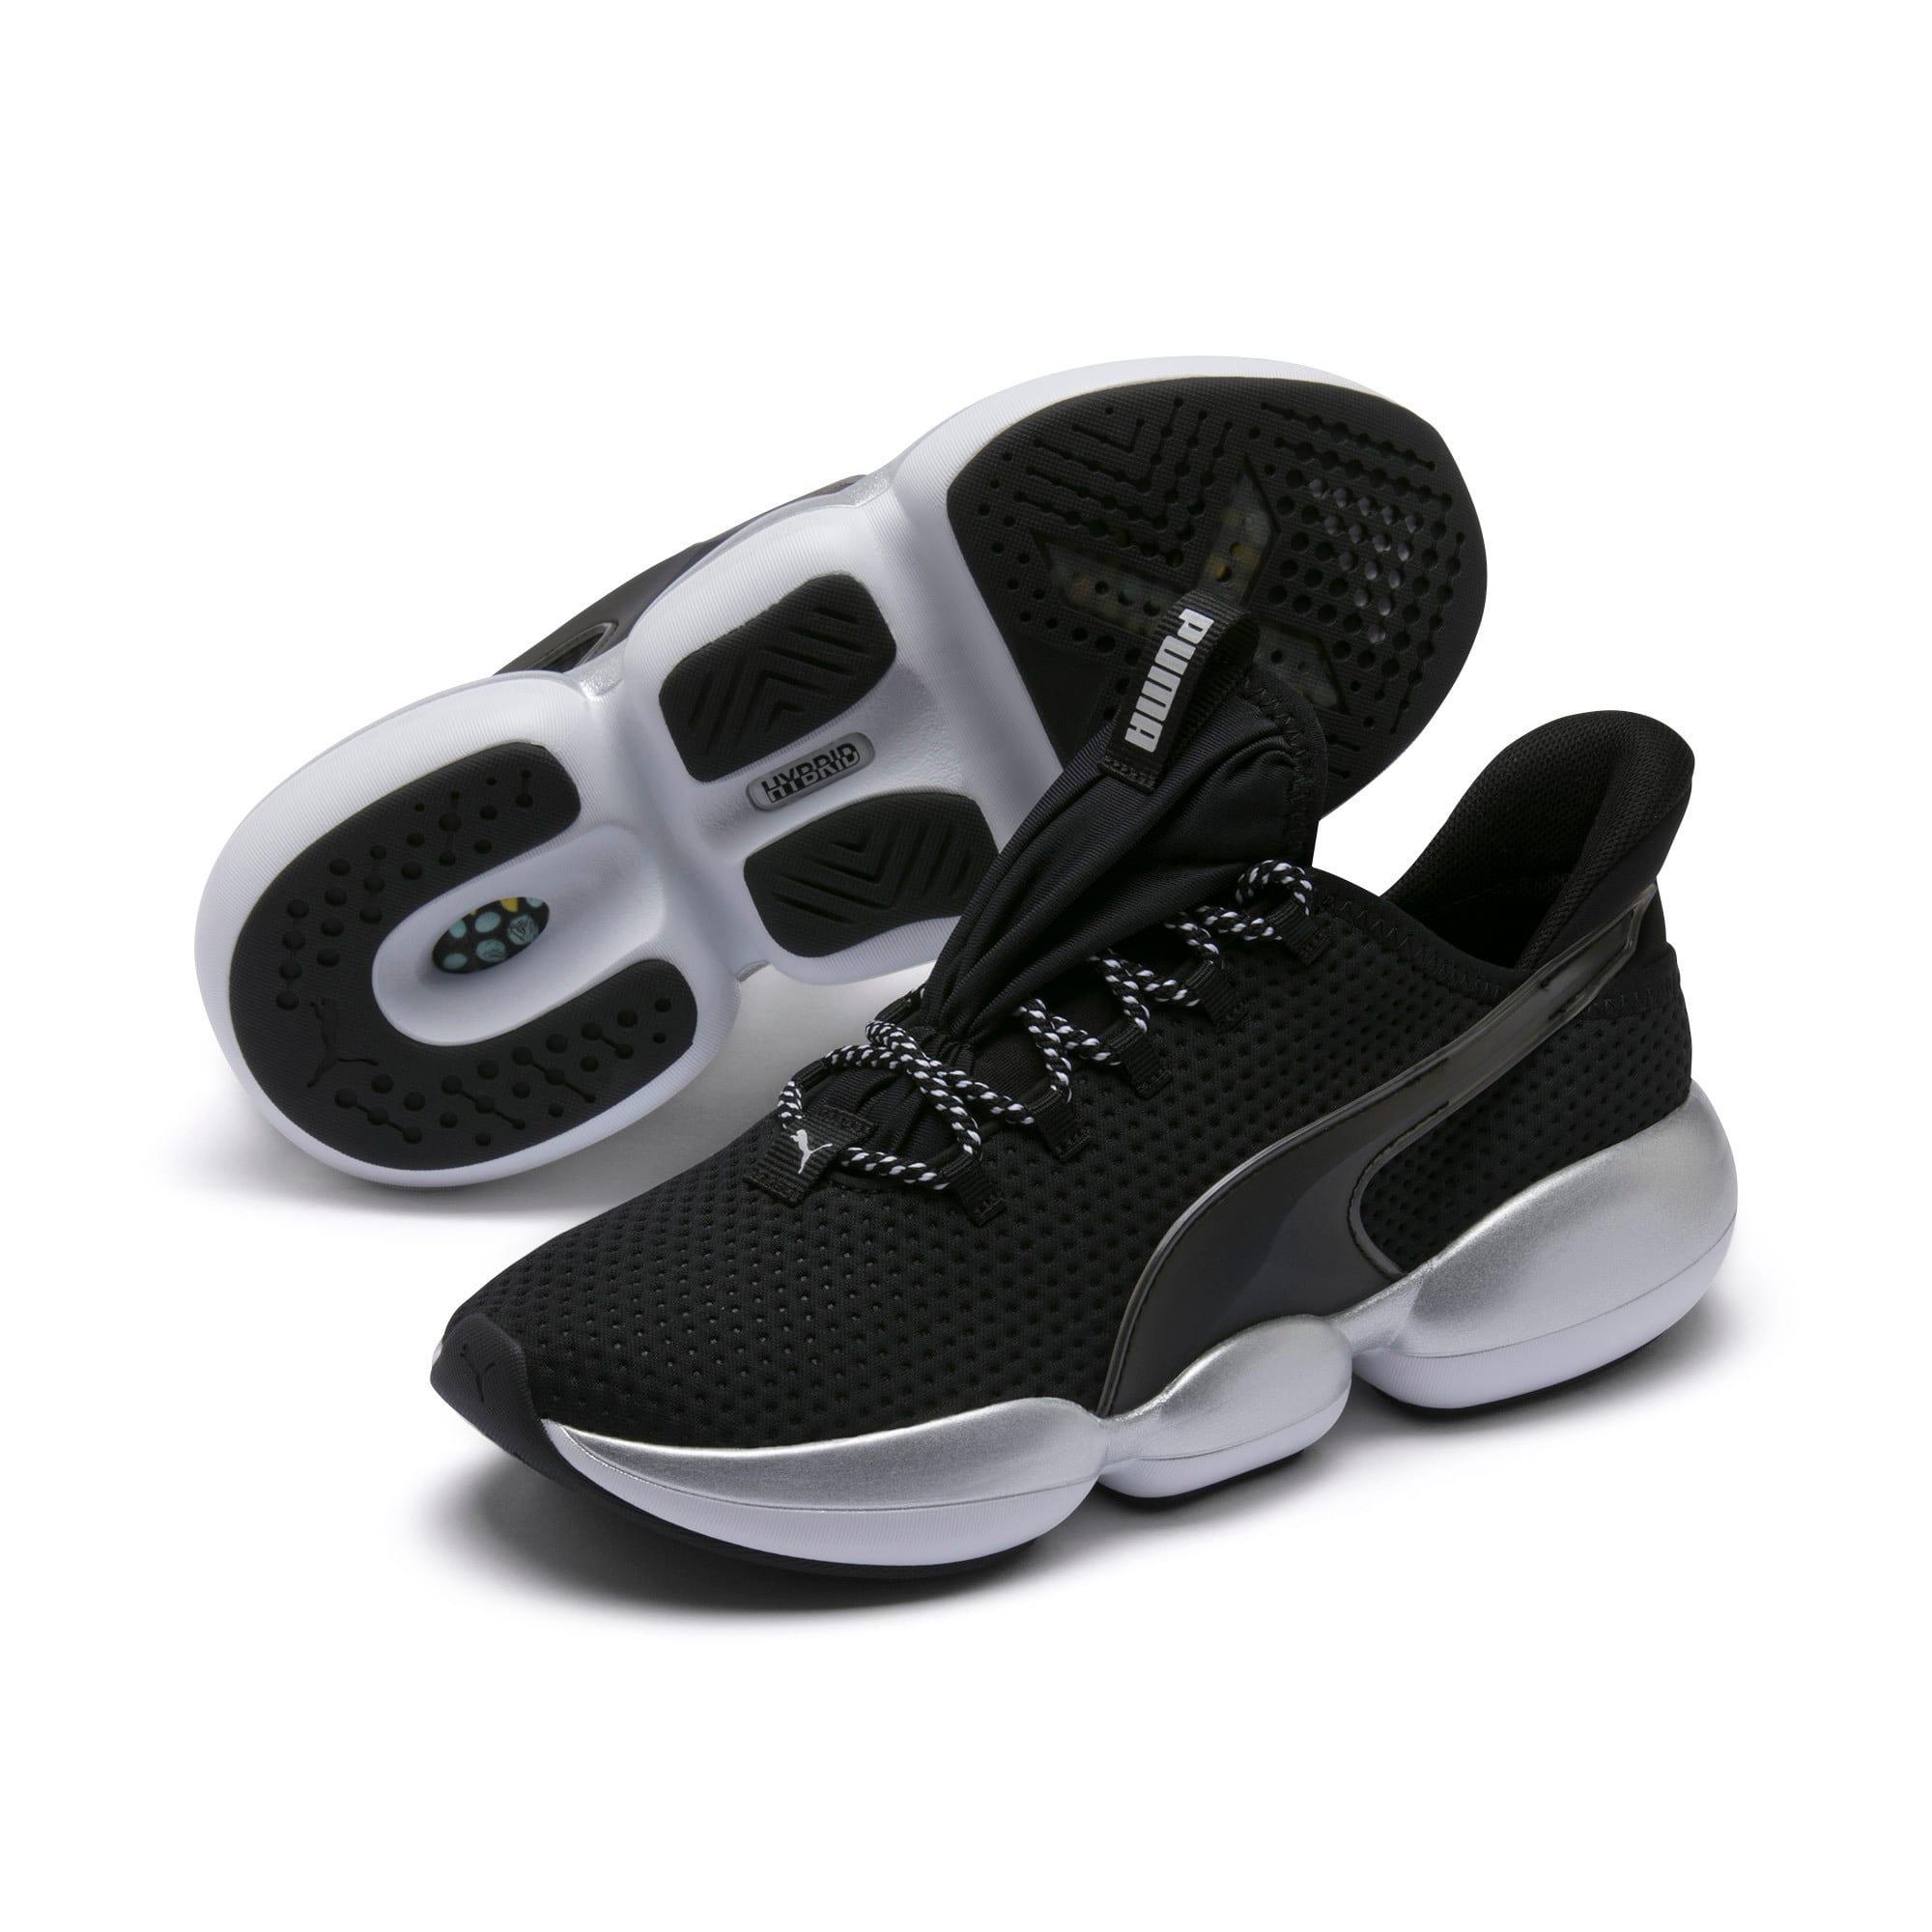 Imagen en miniatura 3 de Zapatillas de training de mujer Mode XT, Puma Black-Puma White, mediana